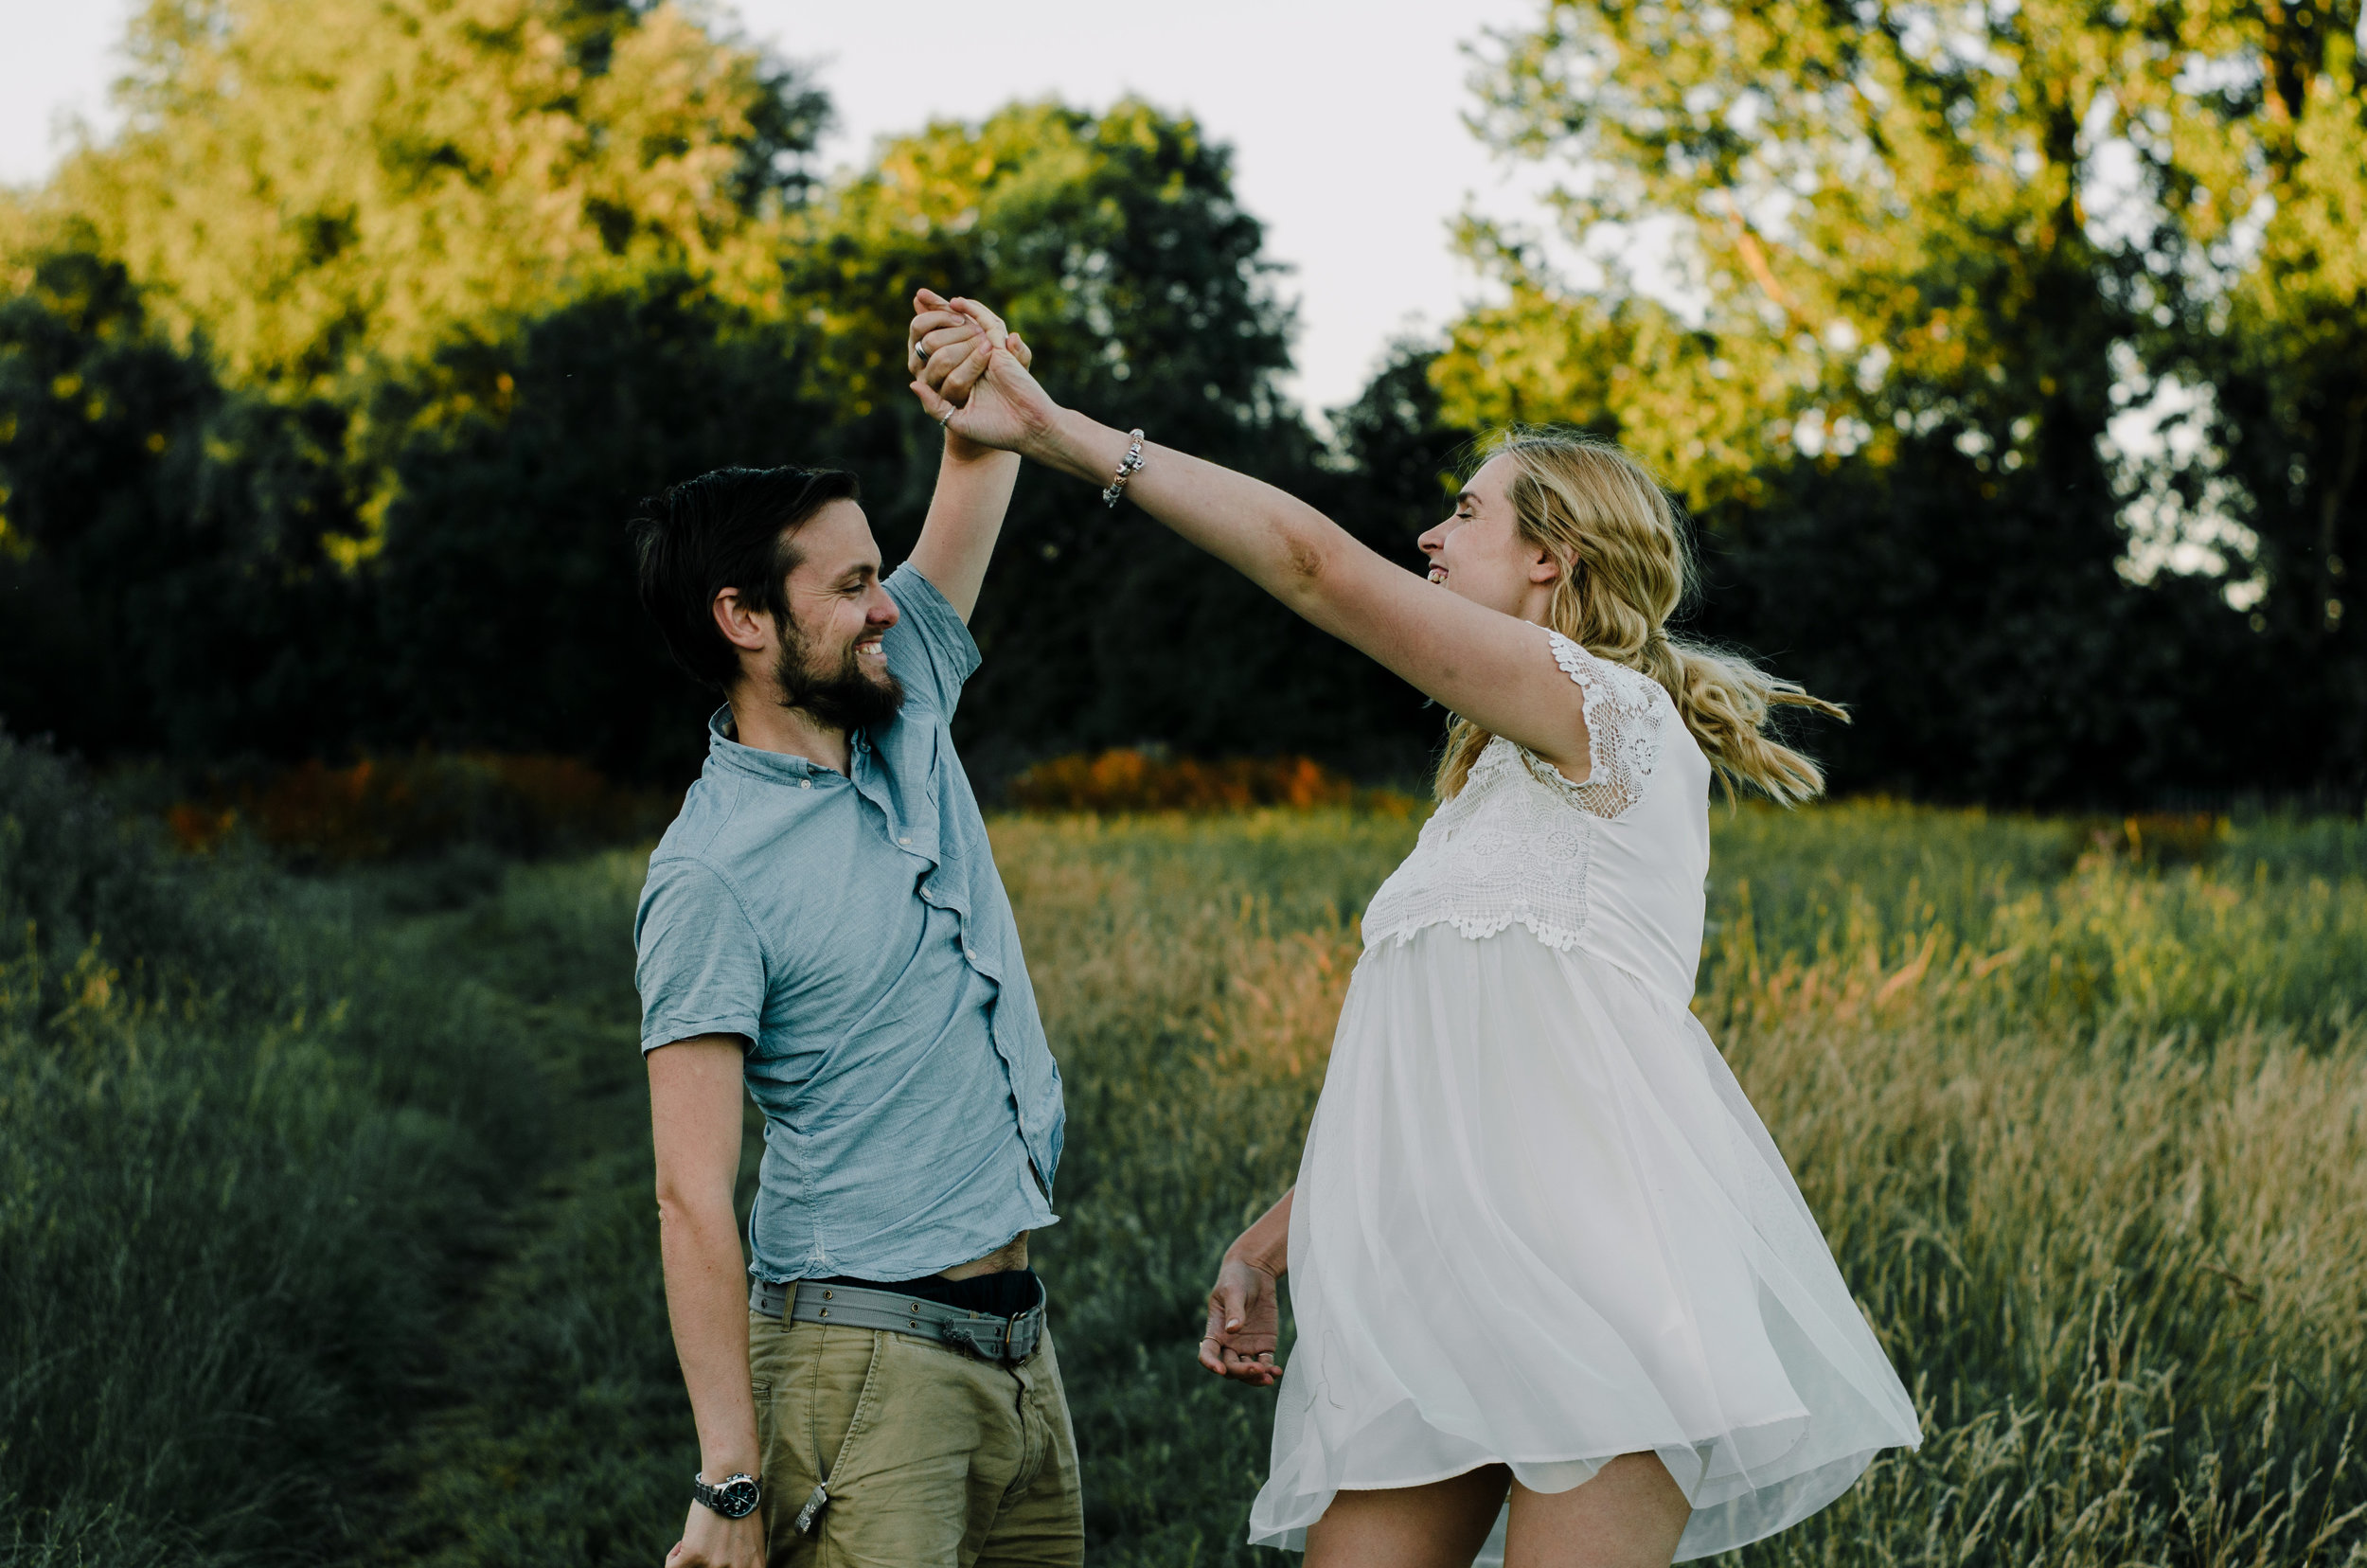 Gina & Chris - Barcombe Mills - Couple Session - Aiste Saulyte Photography-72.jpg